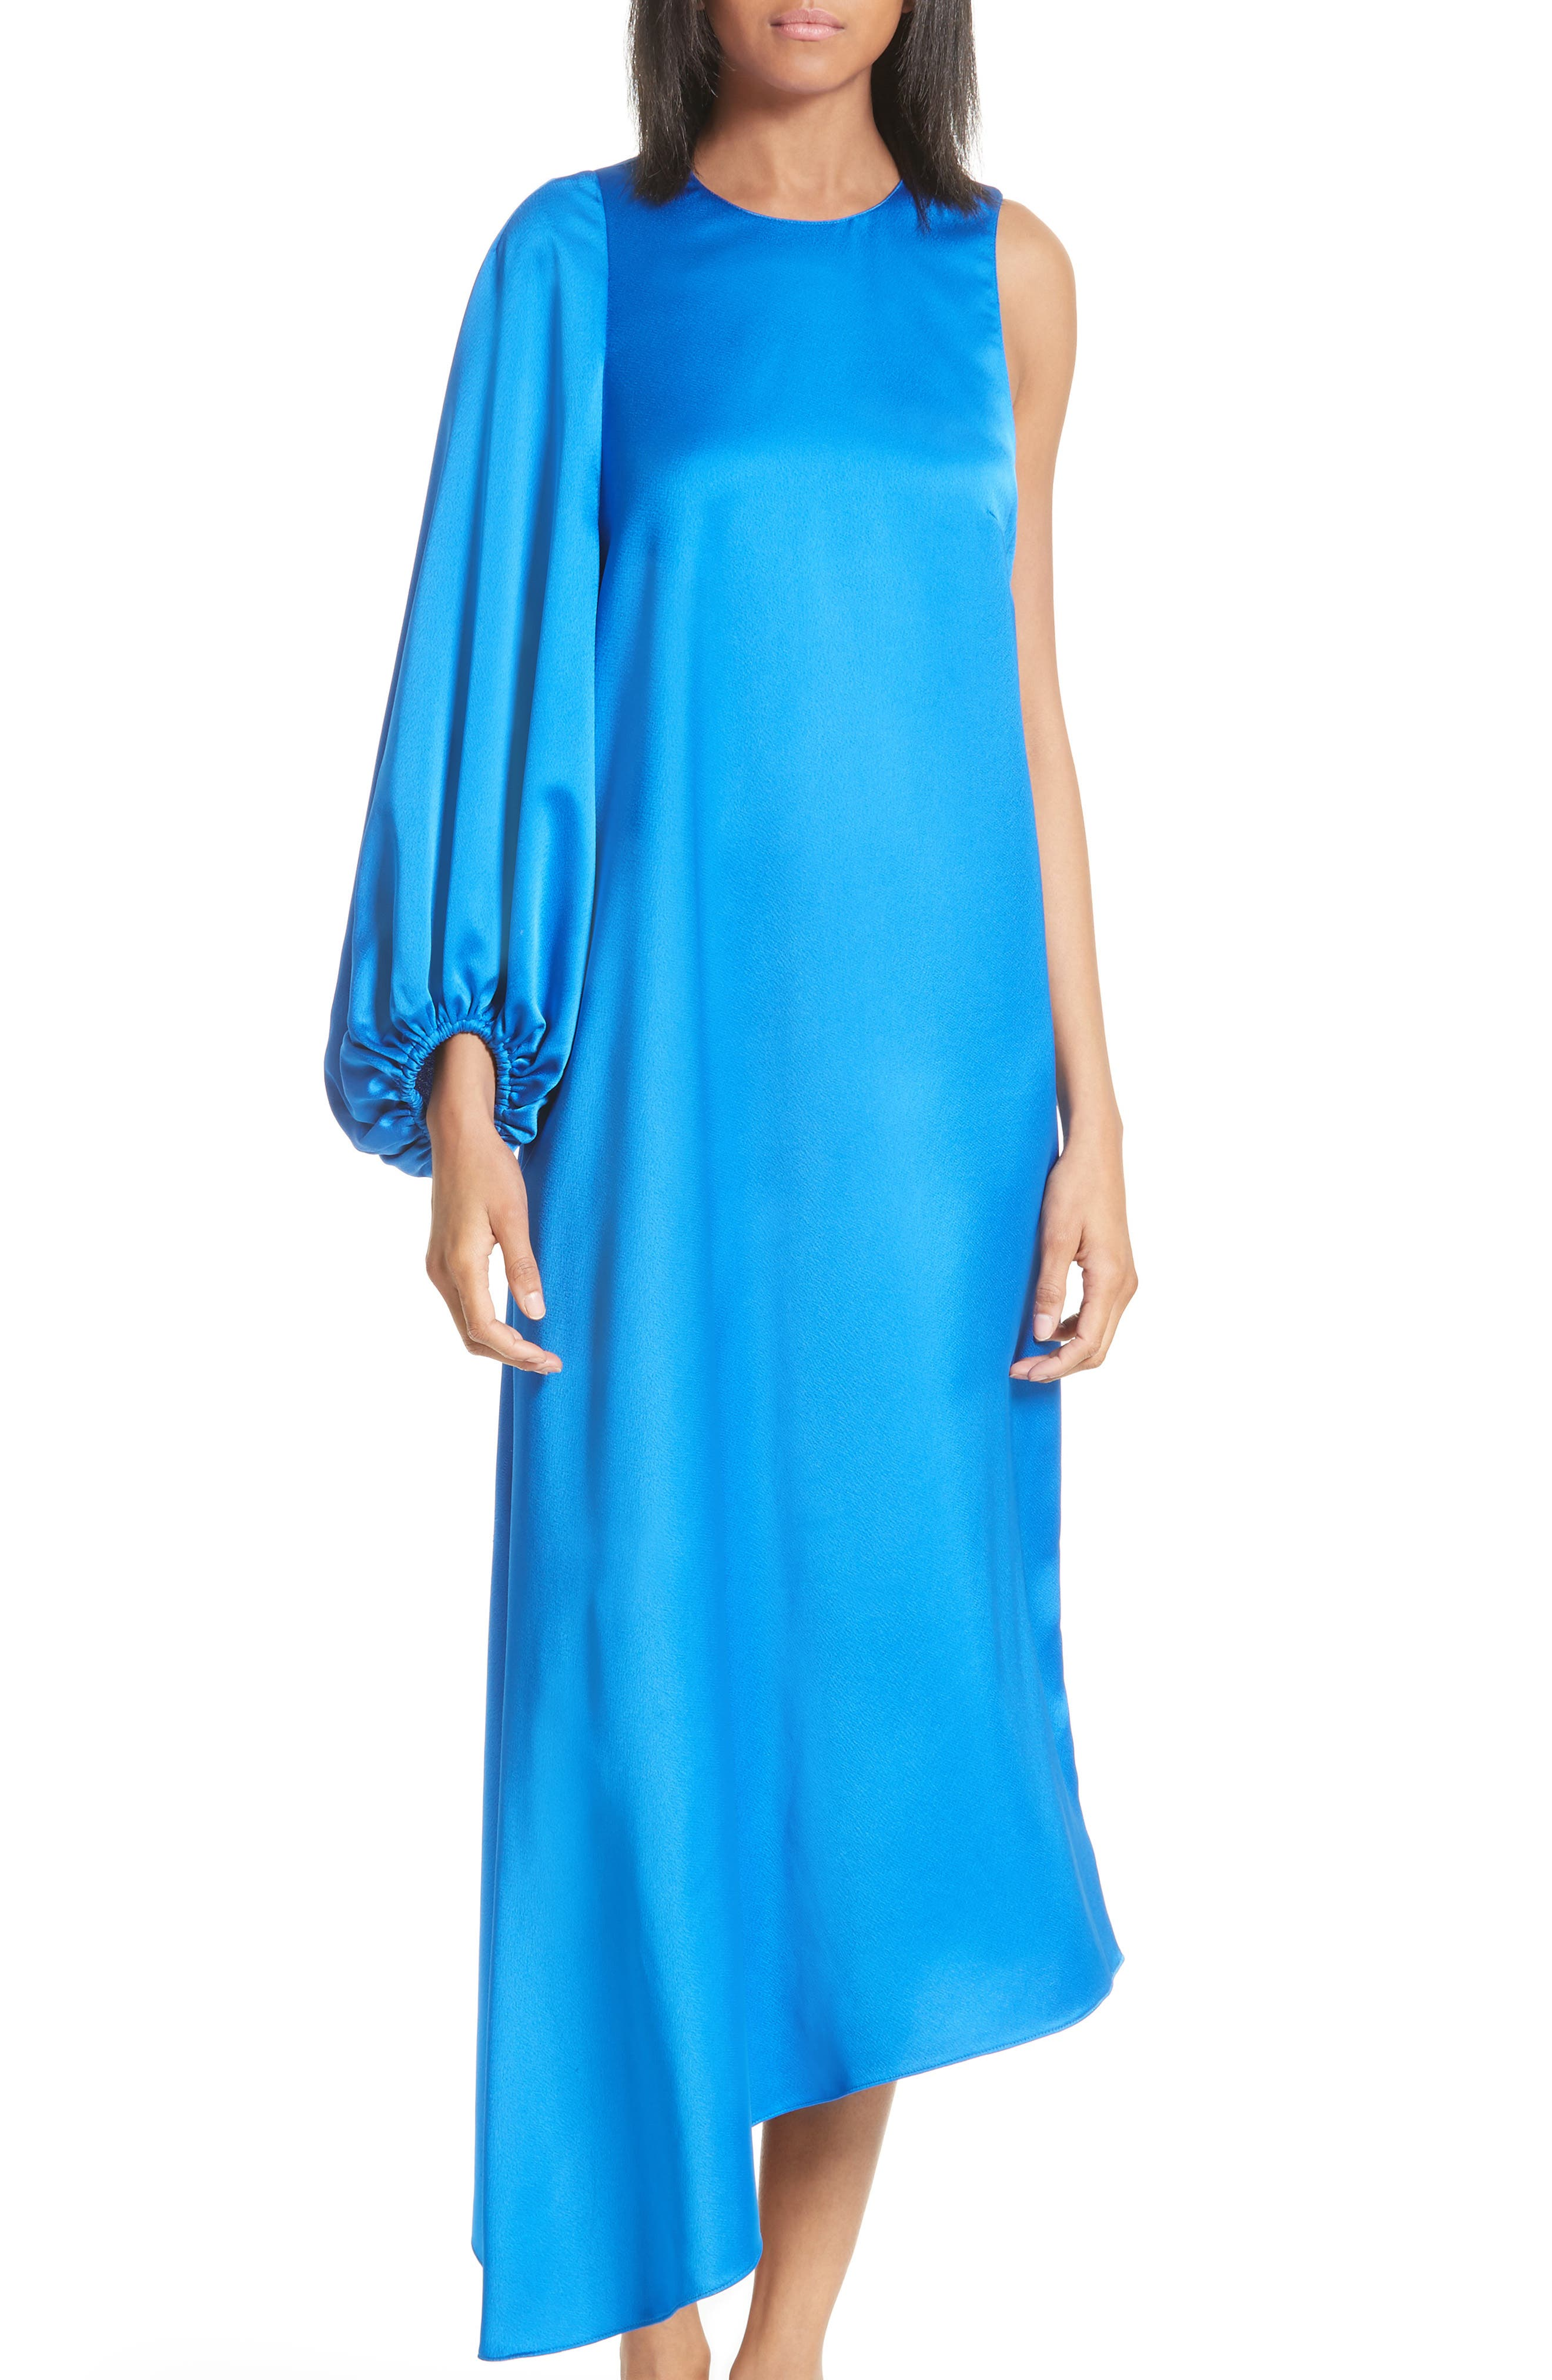 Celestia One Sleeve Bias Cut Satin Dress,                             Alternate thumbnail 5, color,                             408